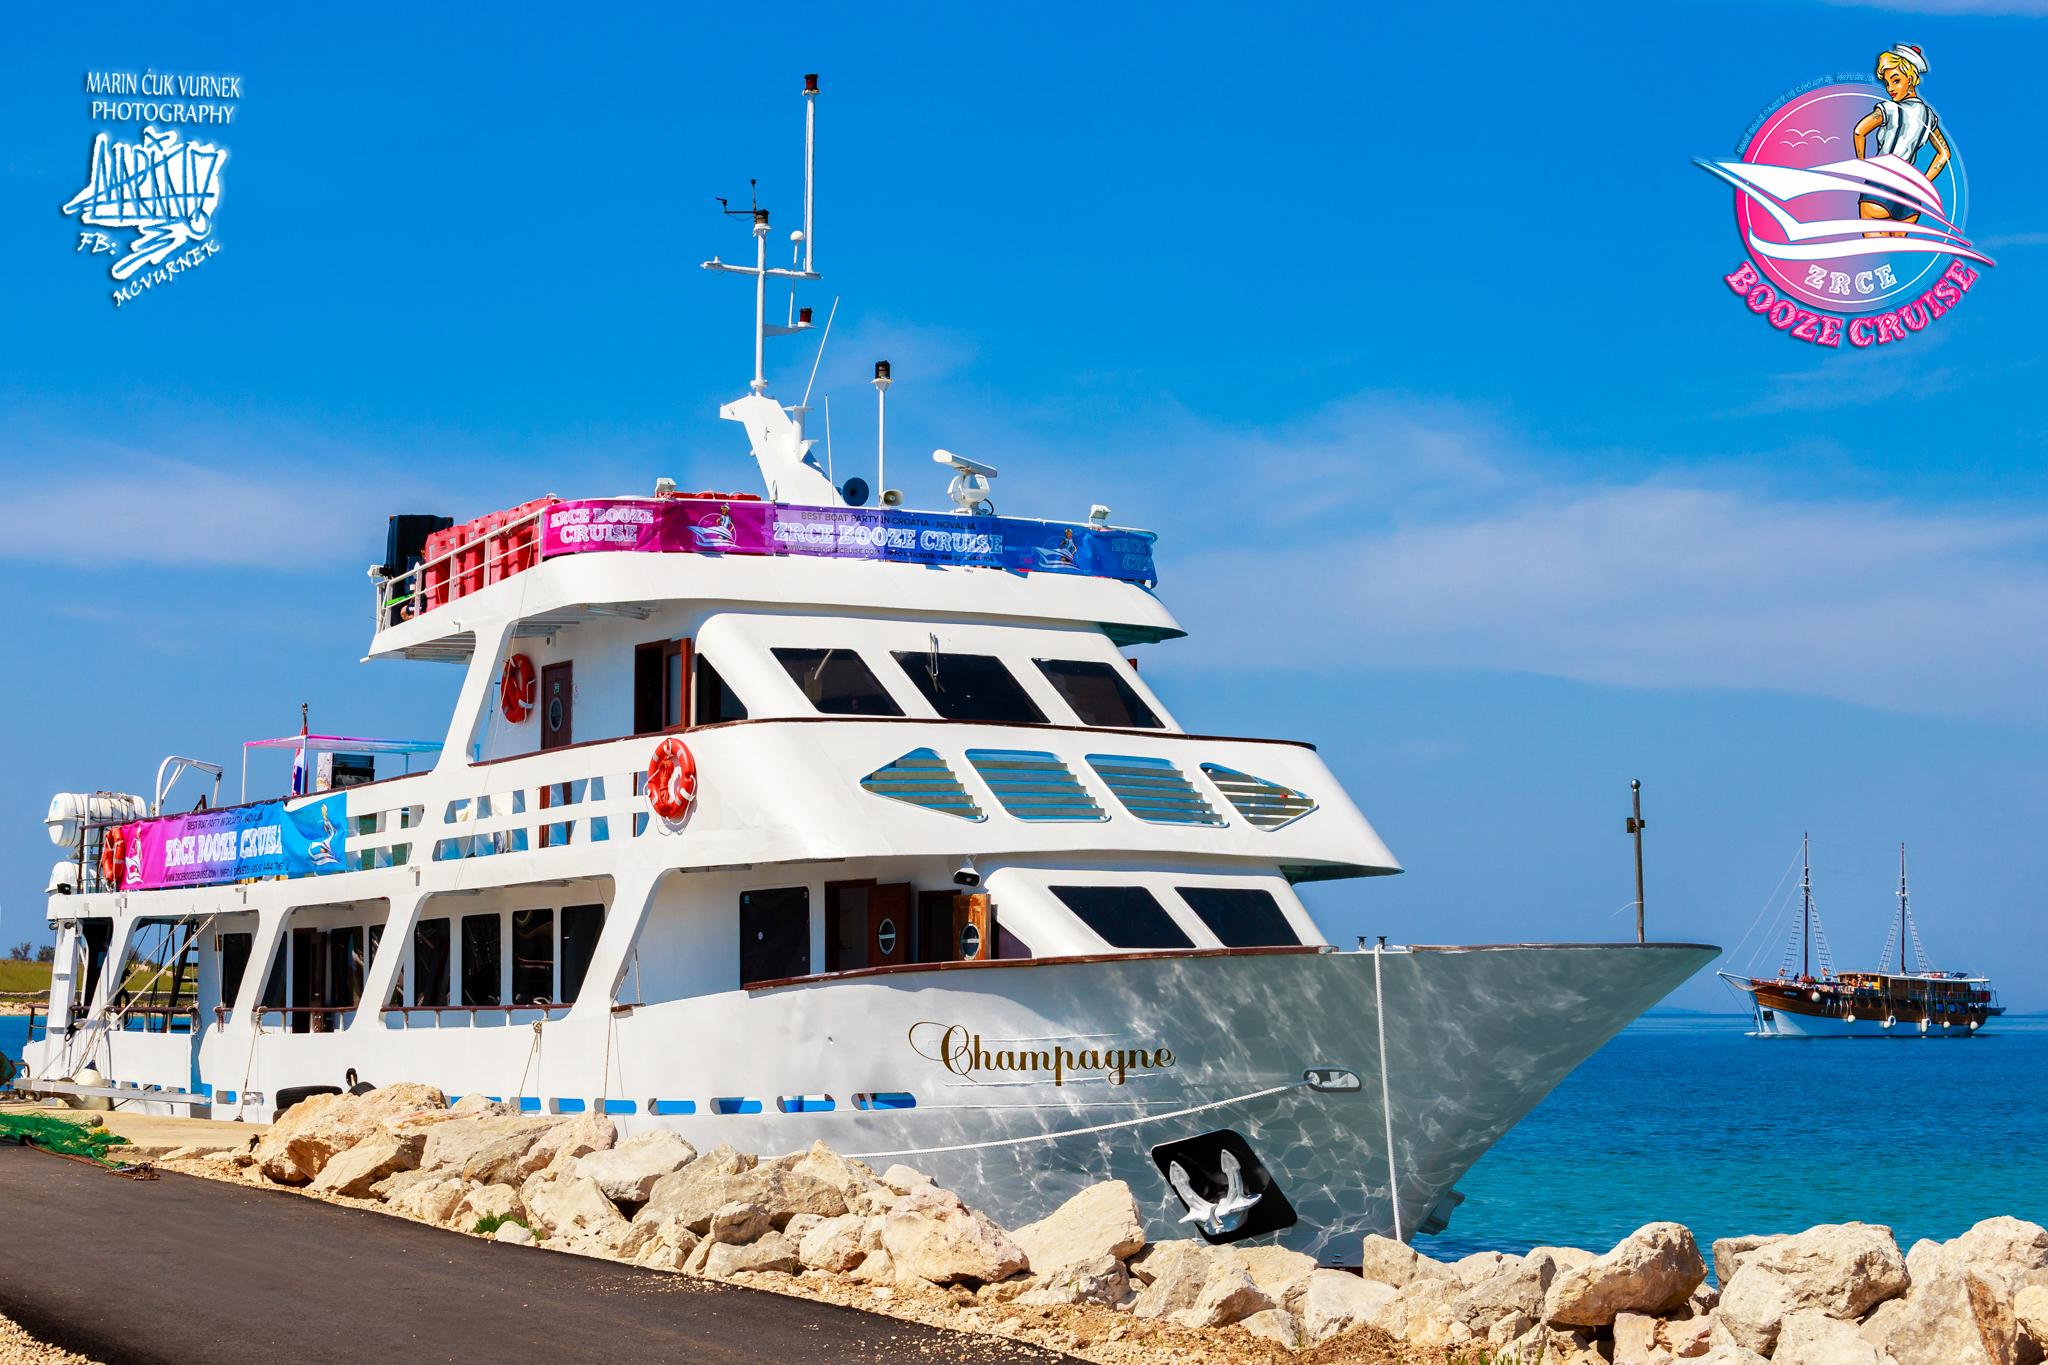 Zrce Booze Cruise